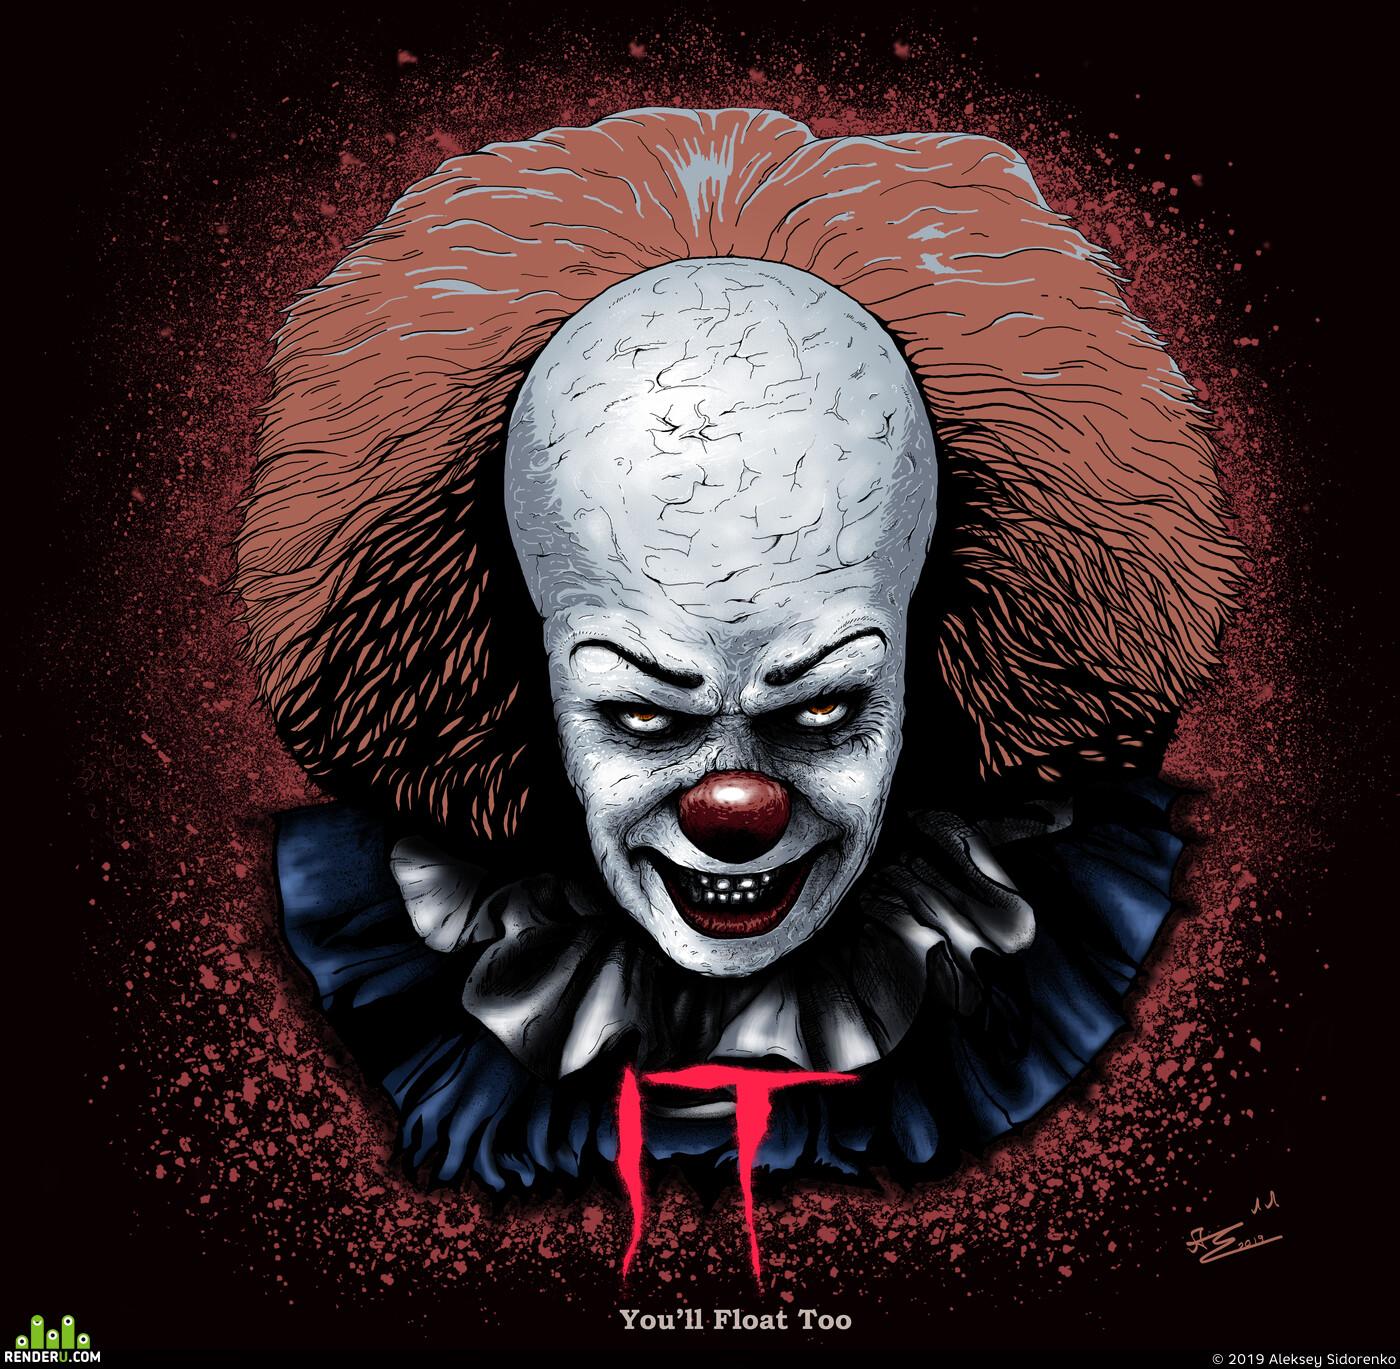 оно, Монстры, клоун, Концепт-арт, арт, Хеллоуин, фильмы, ужасы